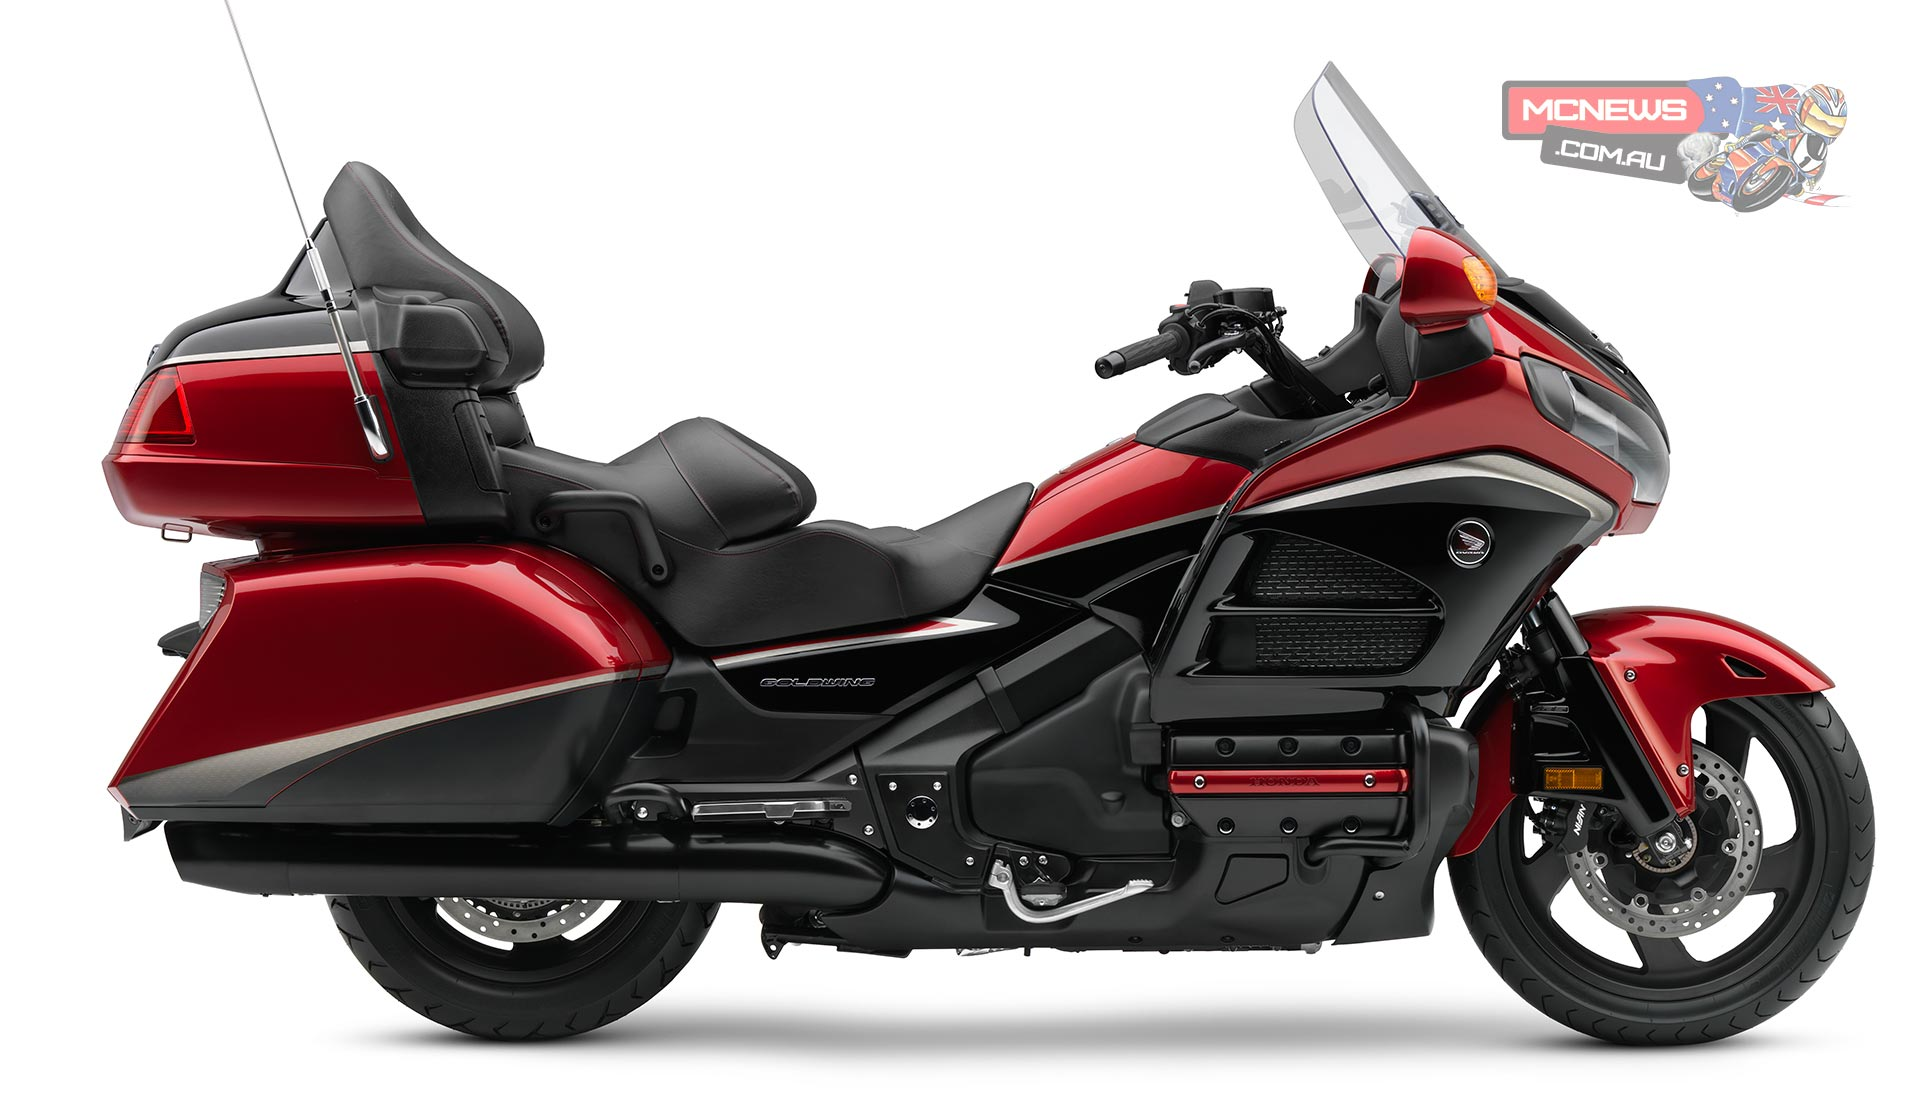 2015 GL1800 Gold Wing - Honda Gold Wing 40th Anniversary Model